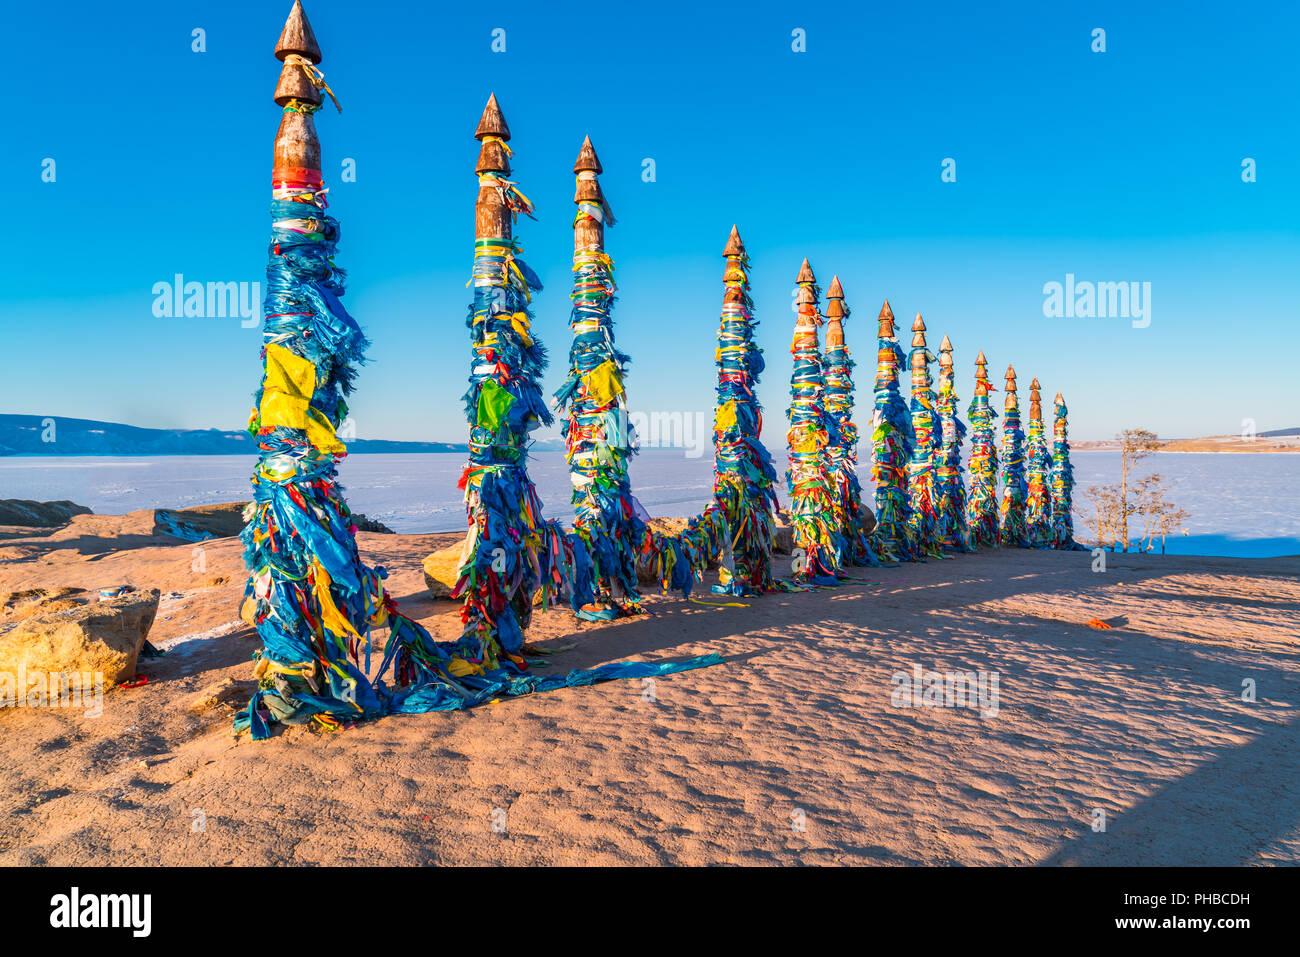 Shaman totem poles at Cape Burkhan on Olkhon Island - Stock Image